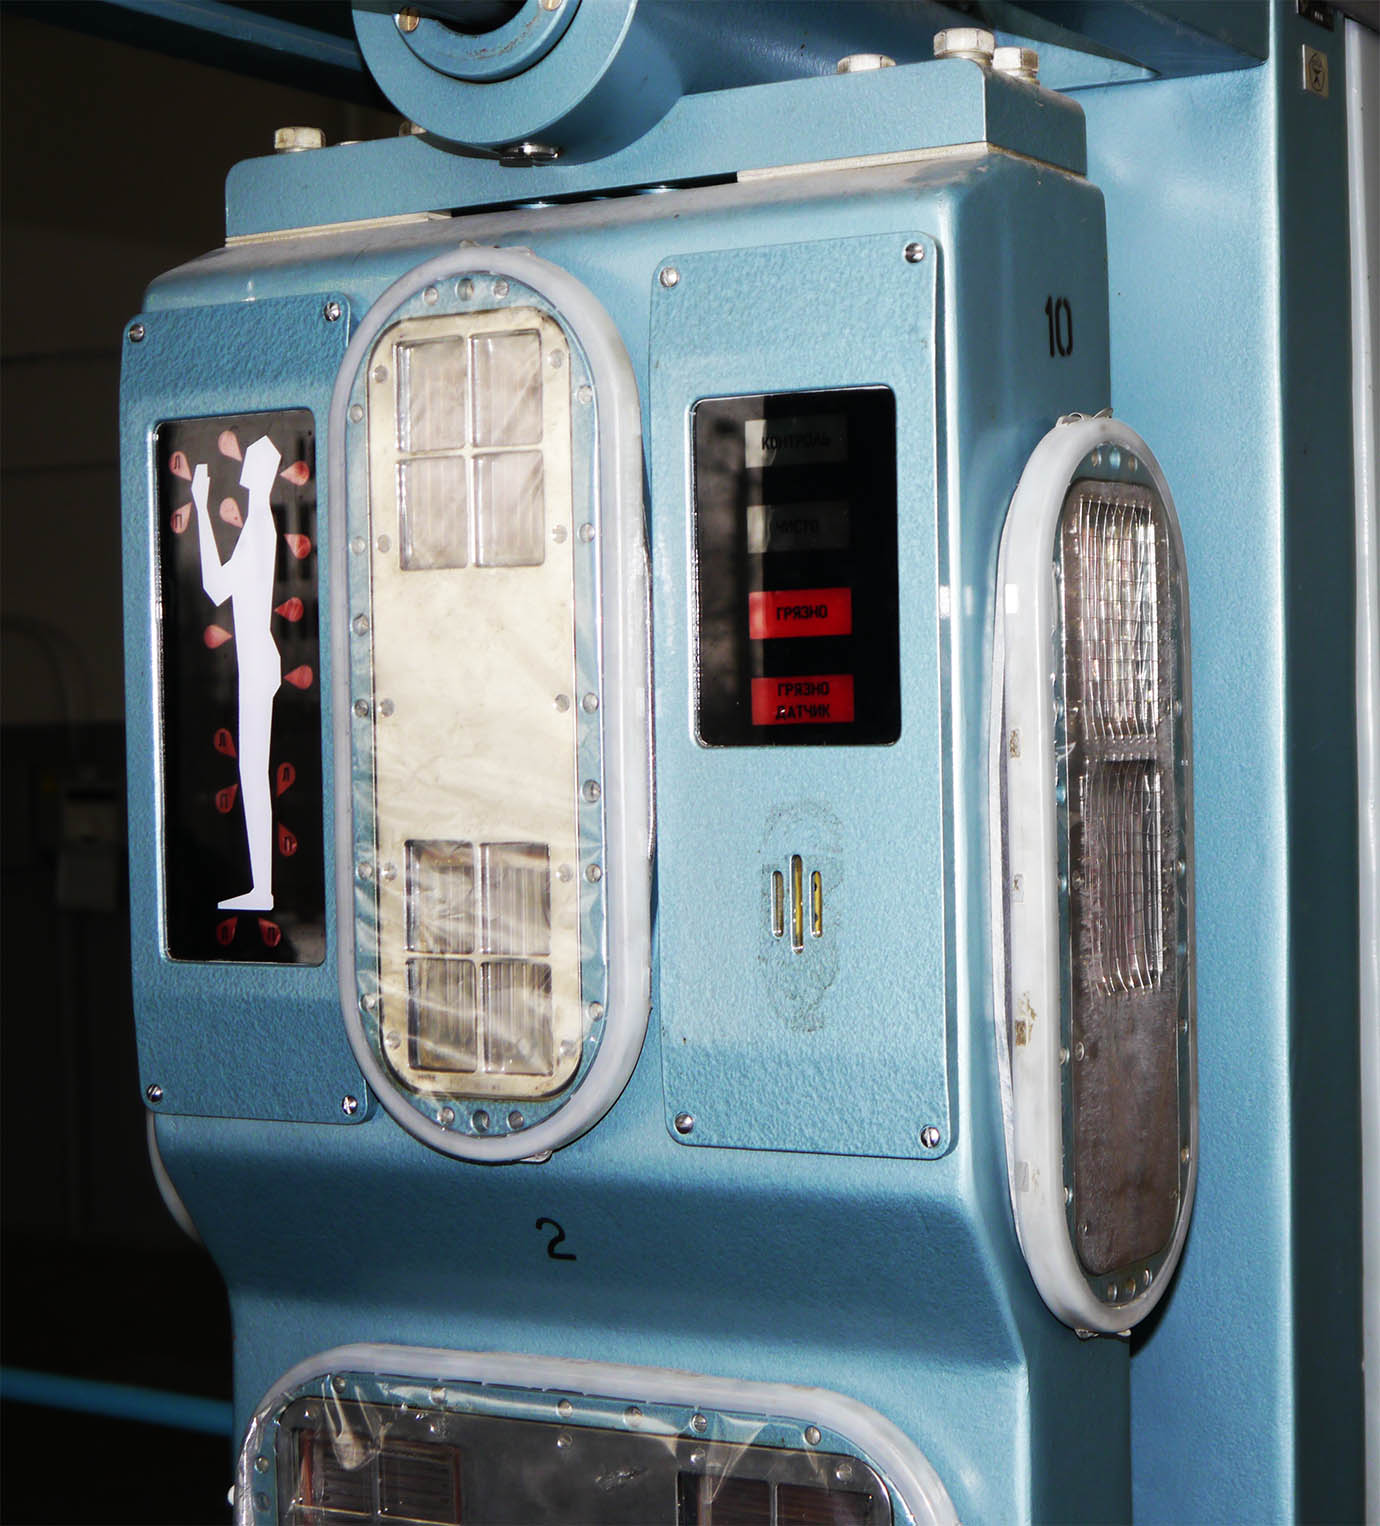 chernobyl-cafeteria48